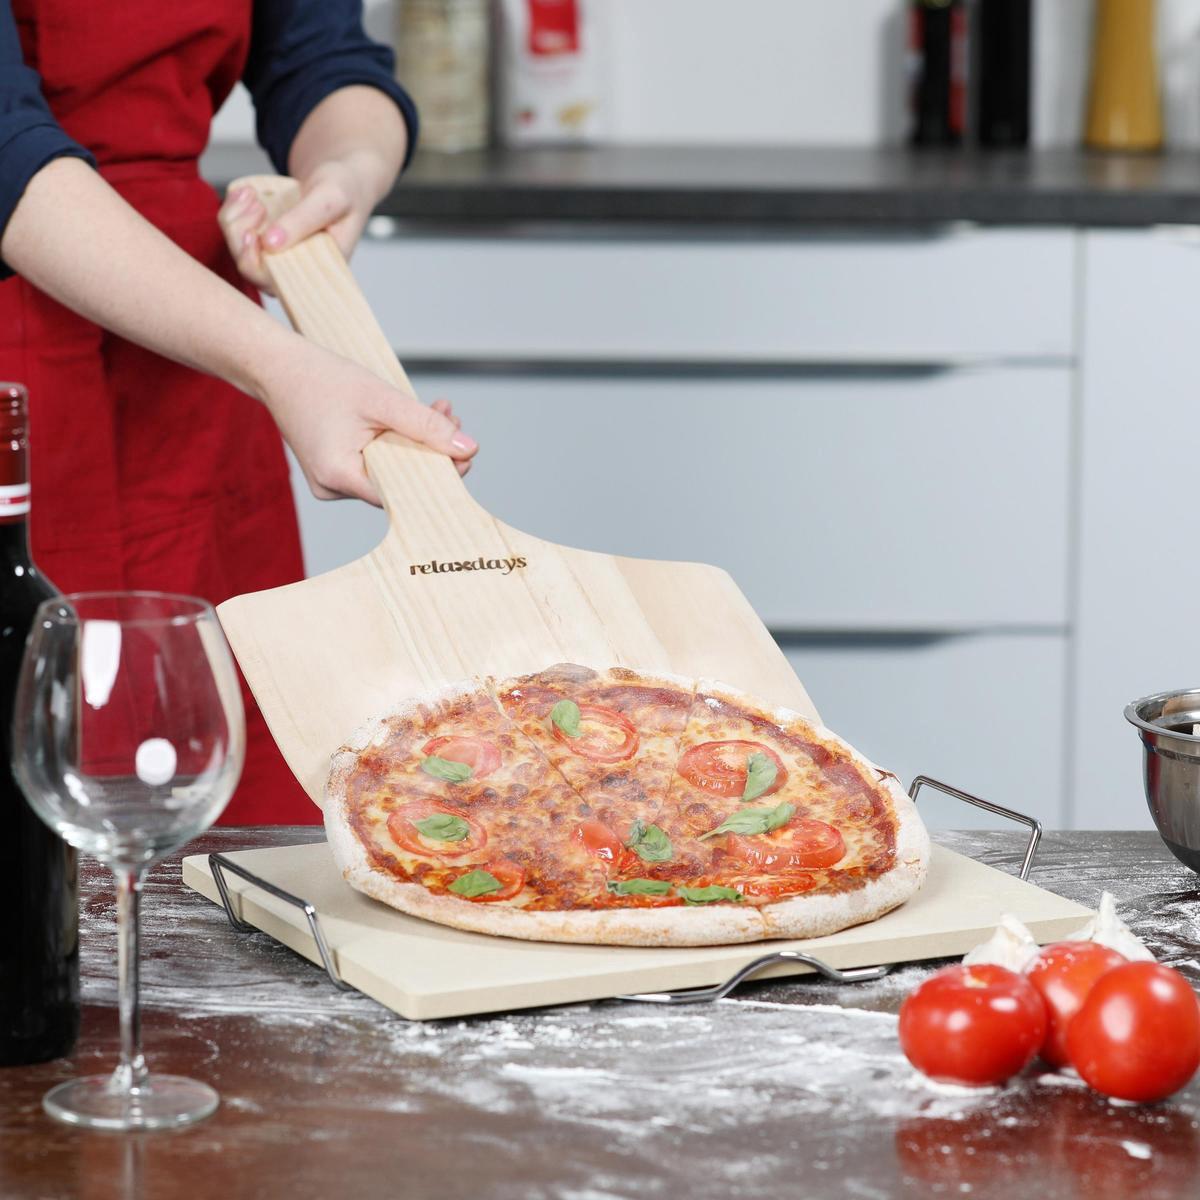 relaxdays pizzaschep XXL, hout, pizzaschep met steel, schep groot, rond pizza